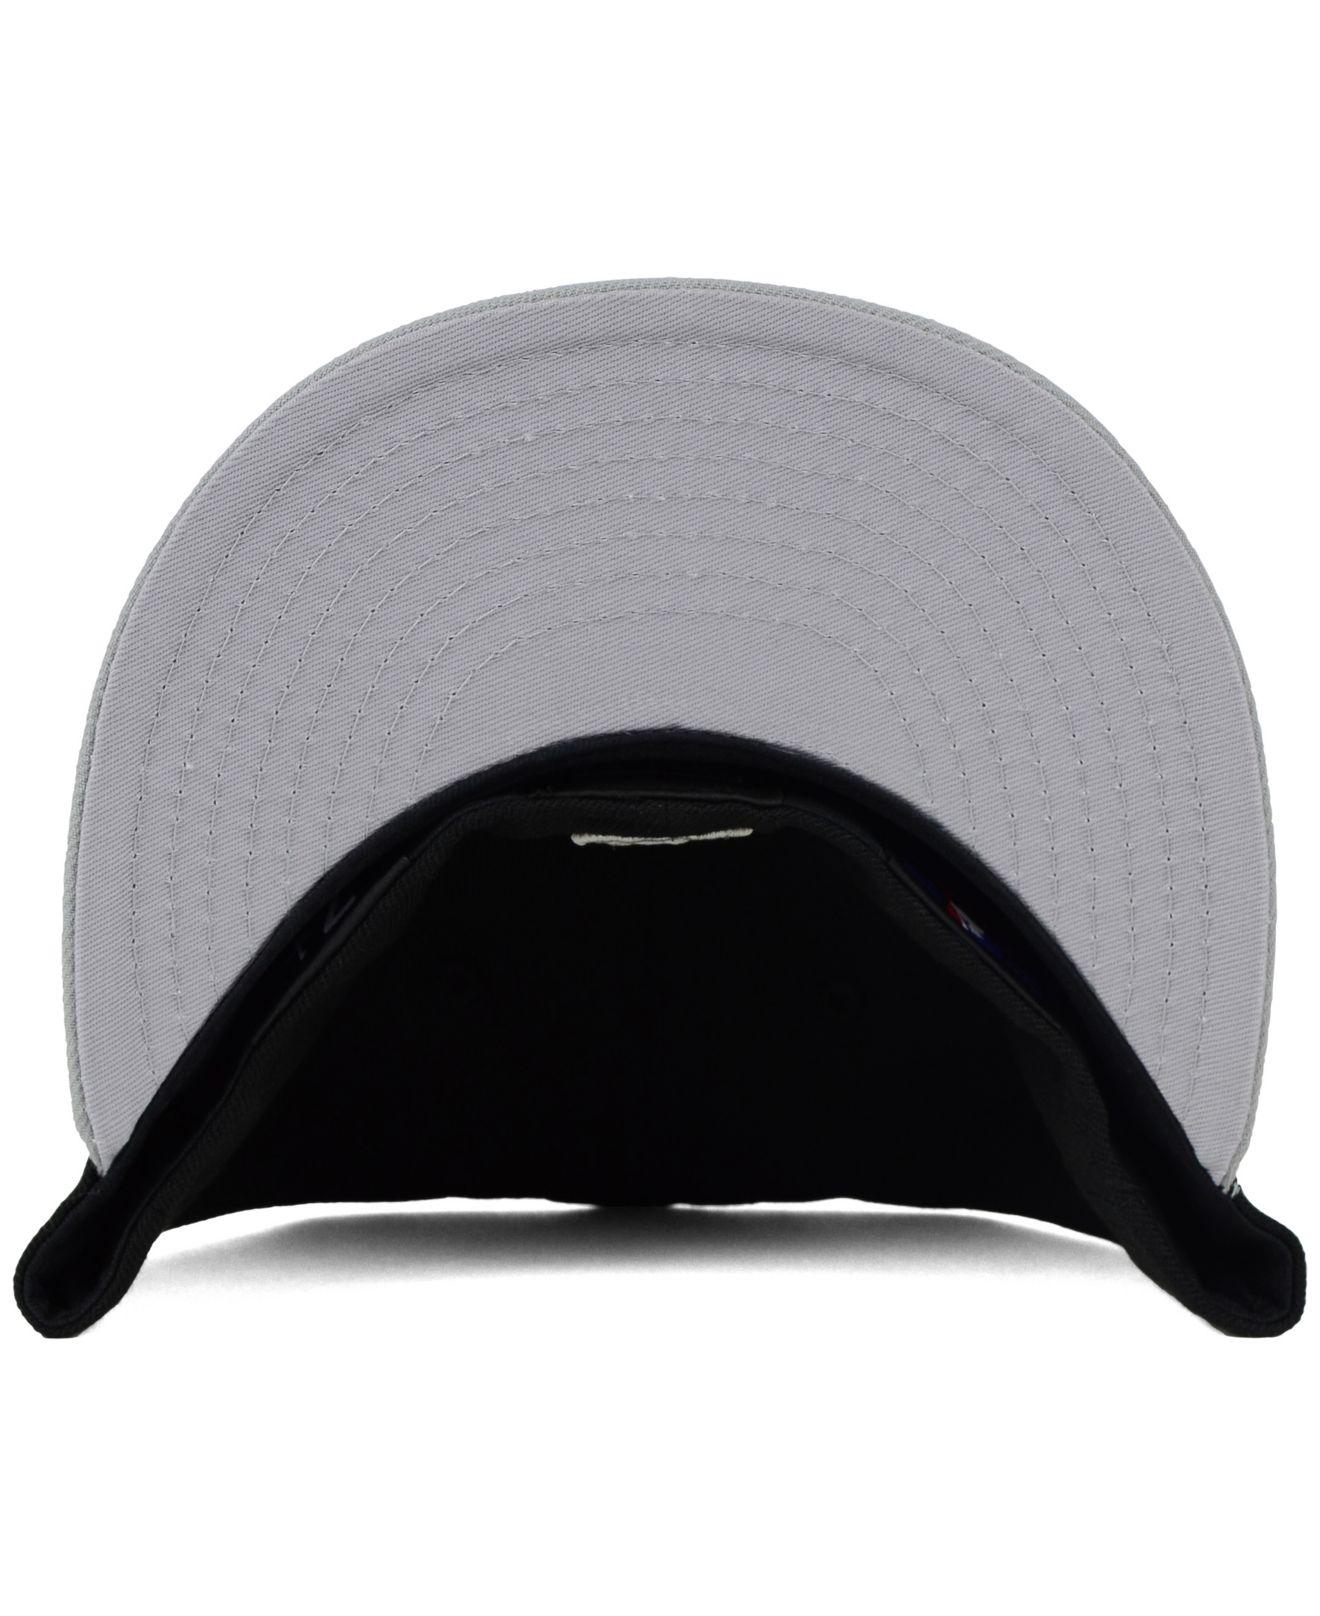 best service ad113 24475 ... sale lyst ktz new york yankees matte metal 59fifty cap in black for men  32c18 a6c81